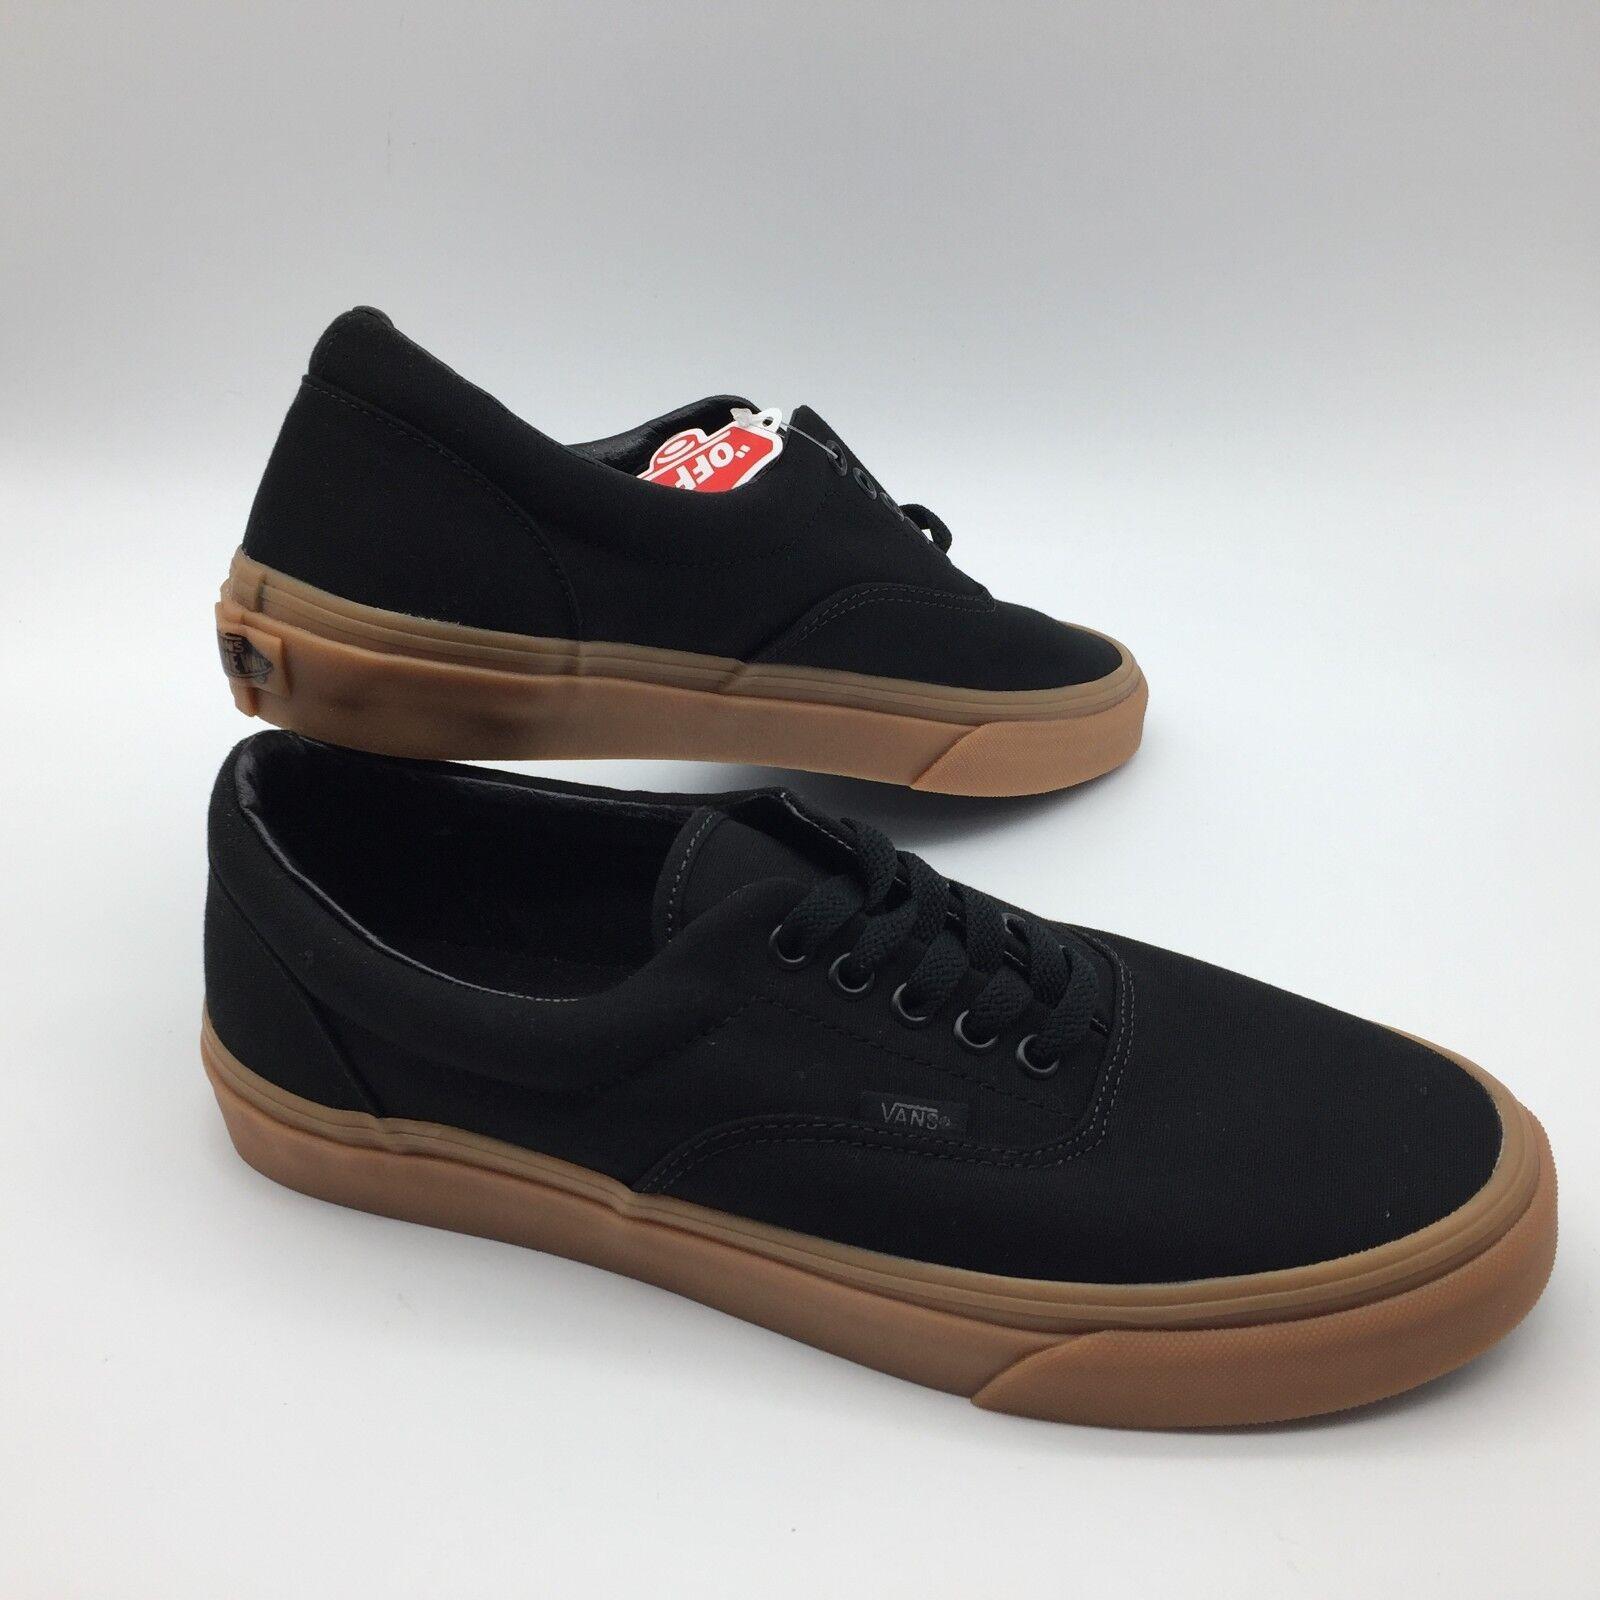 Vans Men's shoes's  Era  Black Classic Gum